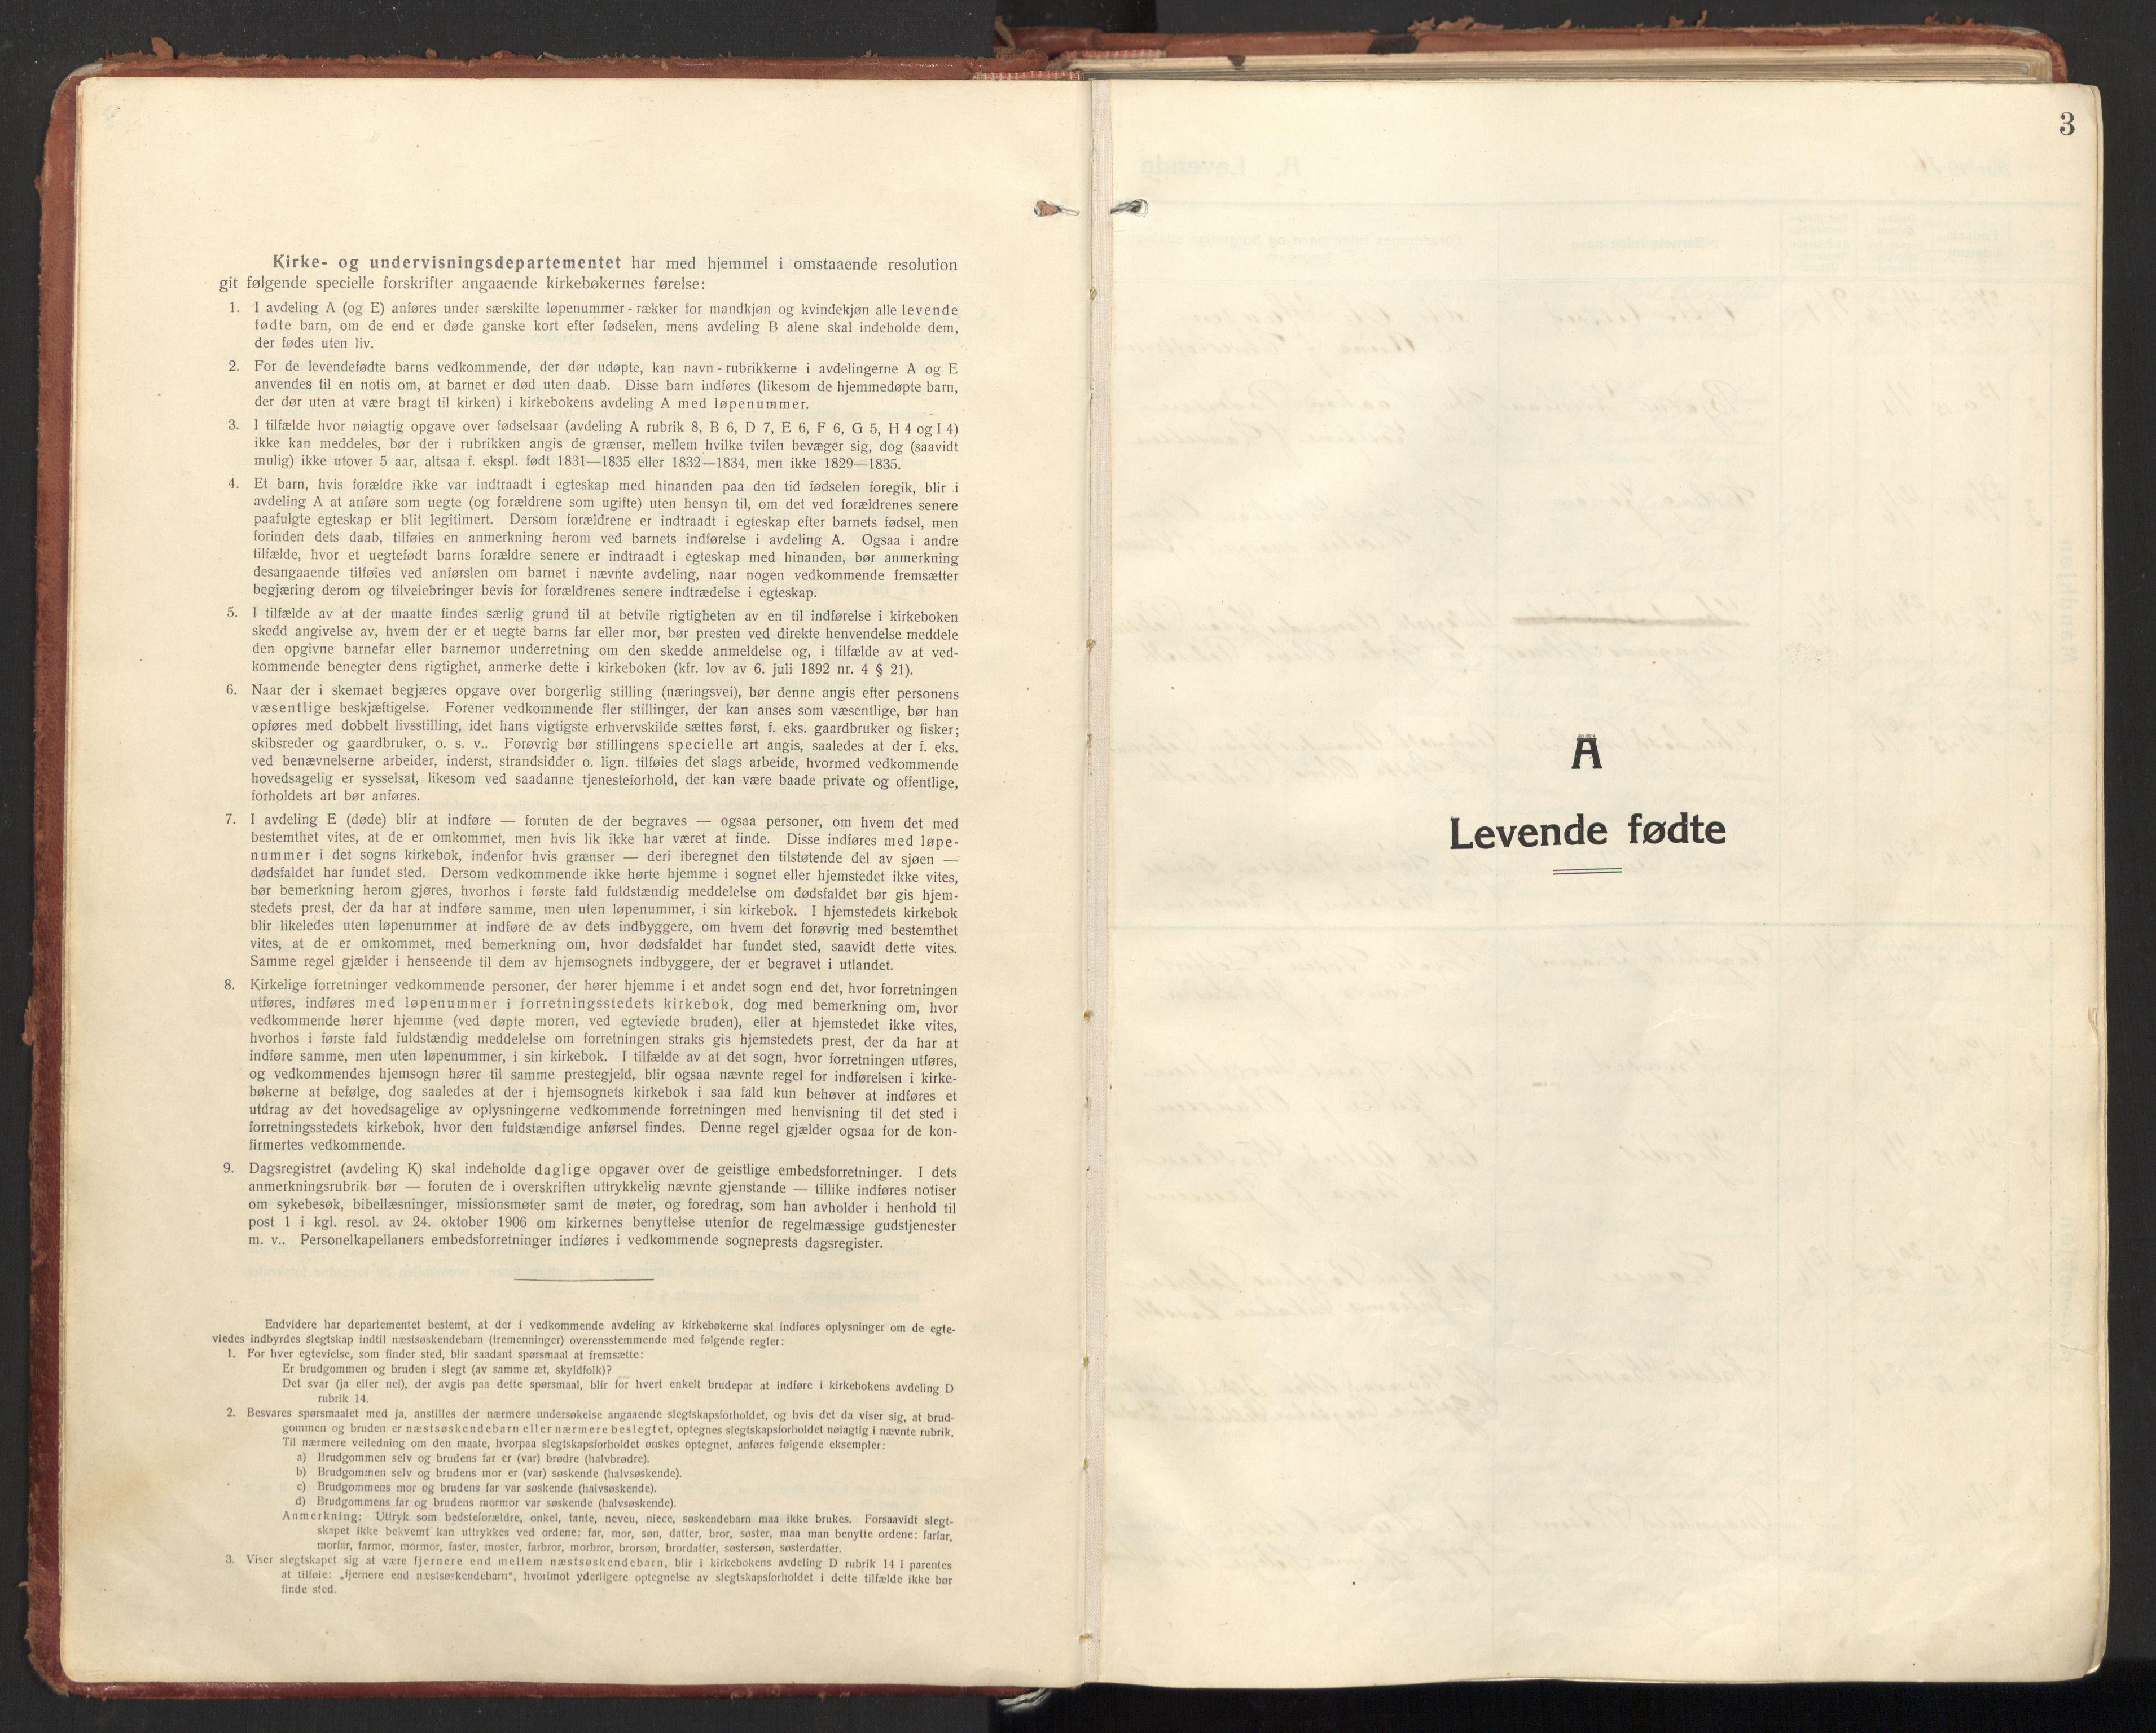 SAT, Ministerialprotokoller, klokkerbøker og fødselsregistre - Nordland, 846/L0650: Ministerialbok nr. 846A08, 1916-1935, s. 3